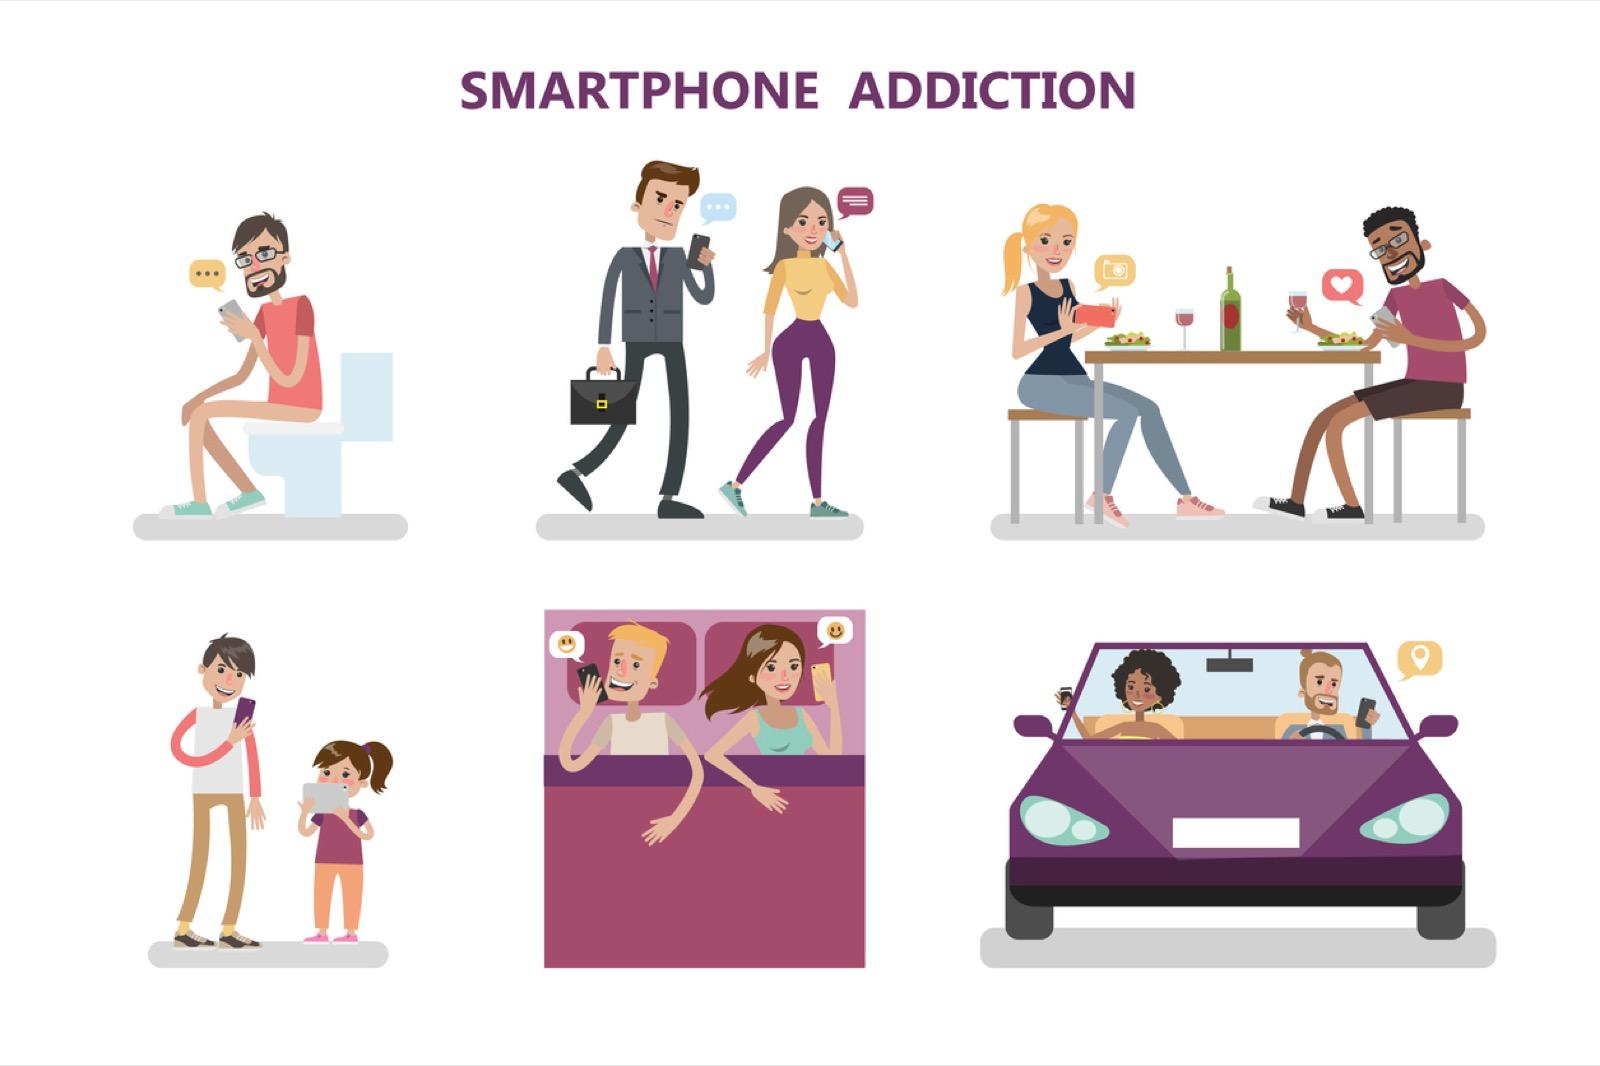 Smartphone-addiction-concept-illustration.-918093444_1257x837 (1)_Web.jpeg